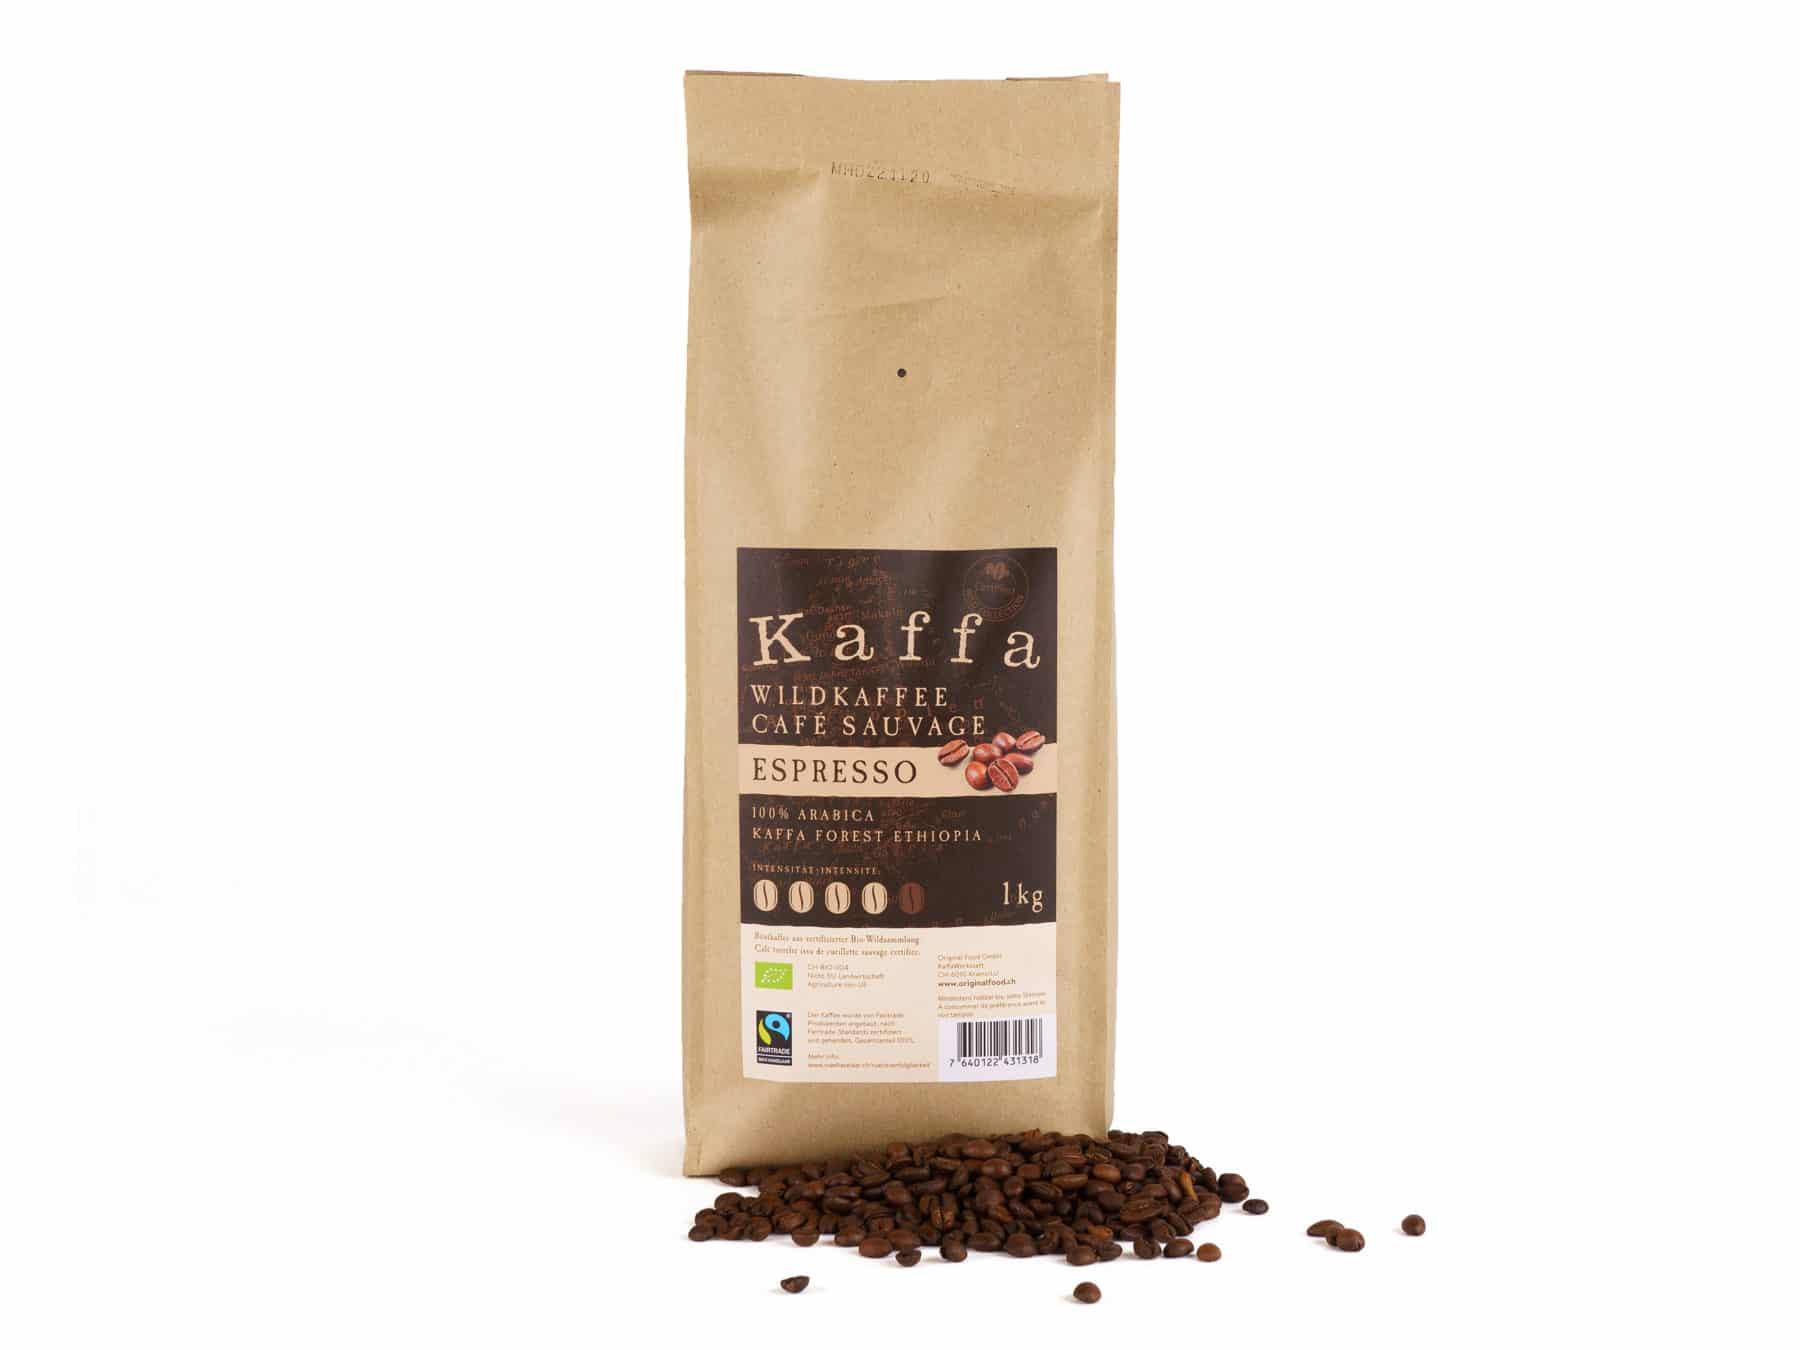 Kaffa Wildkaffee Espresso Original Food Bio KURTS